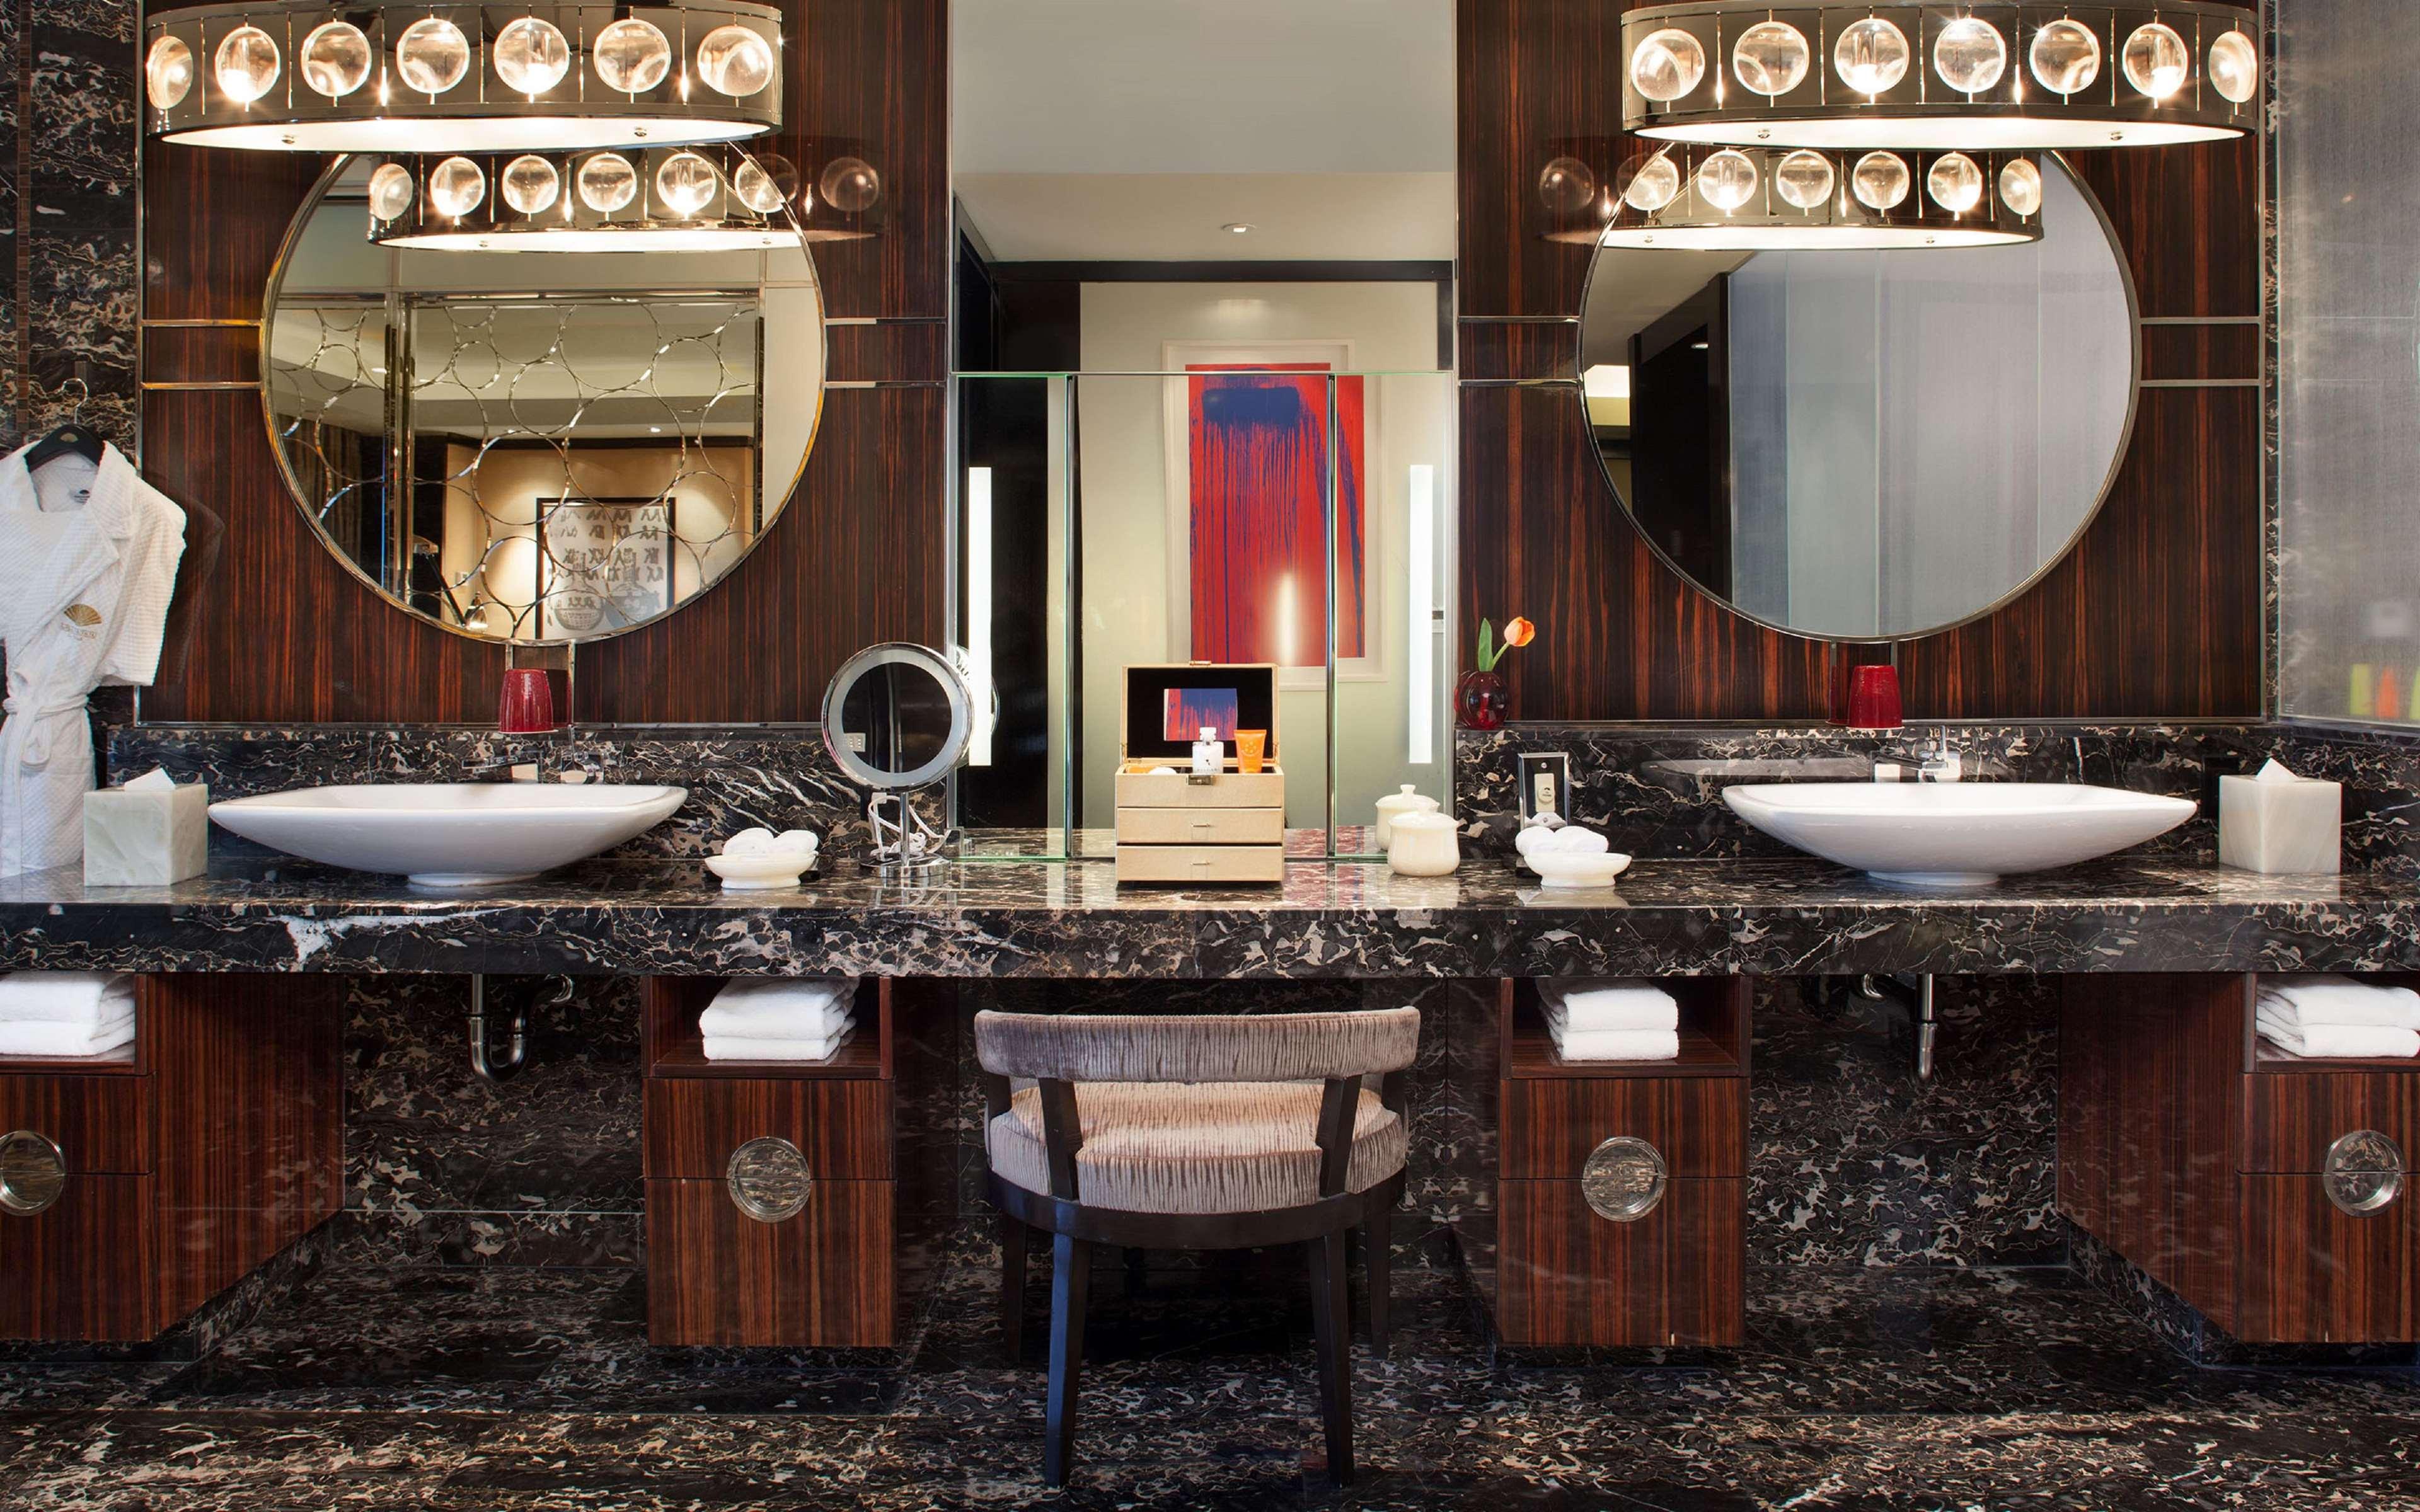 Waldorf Astoria Las Vegas image 40